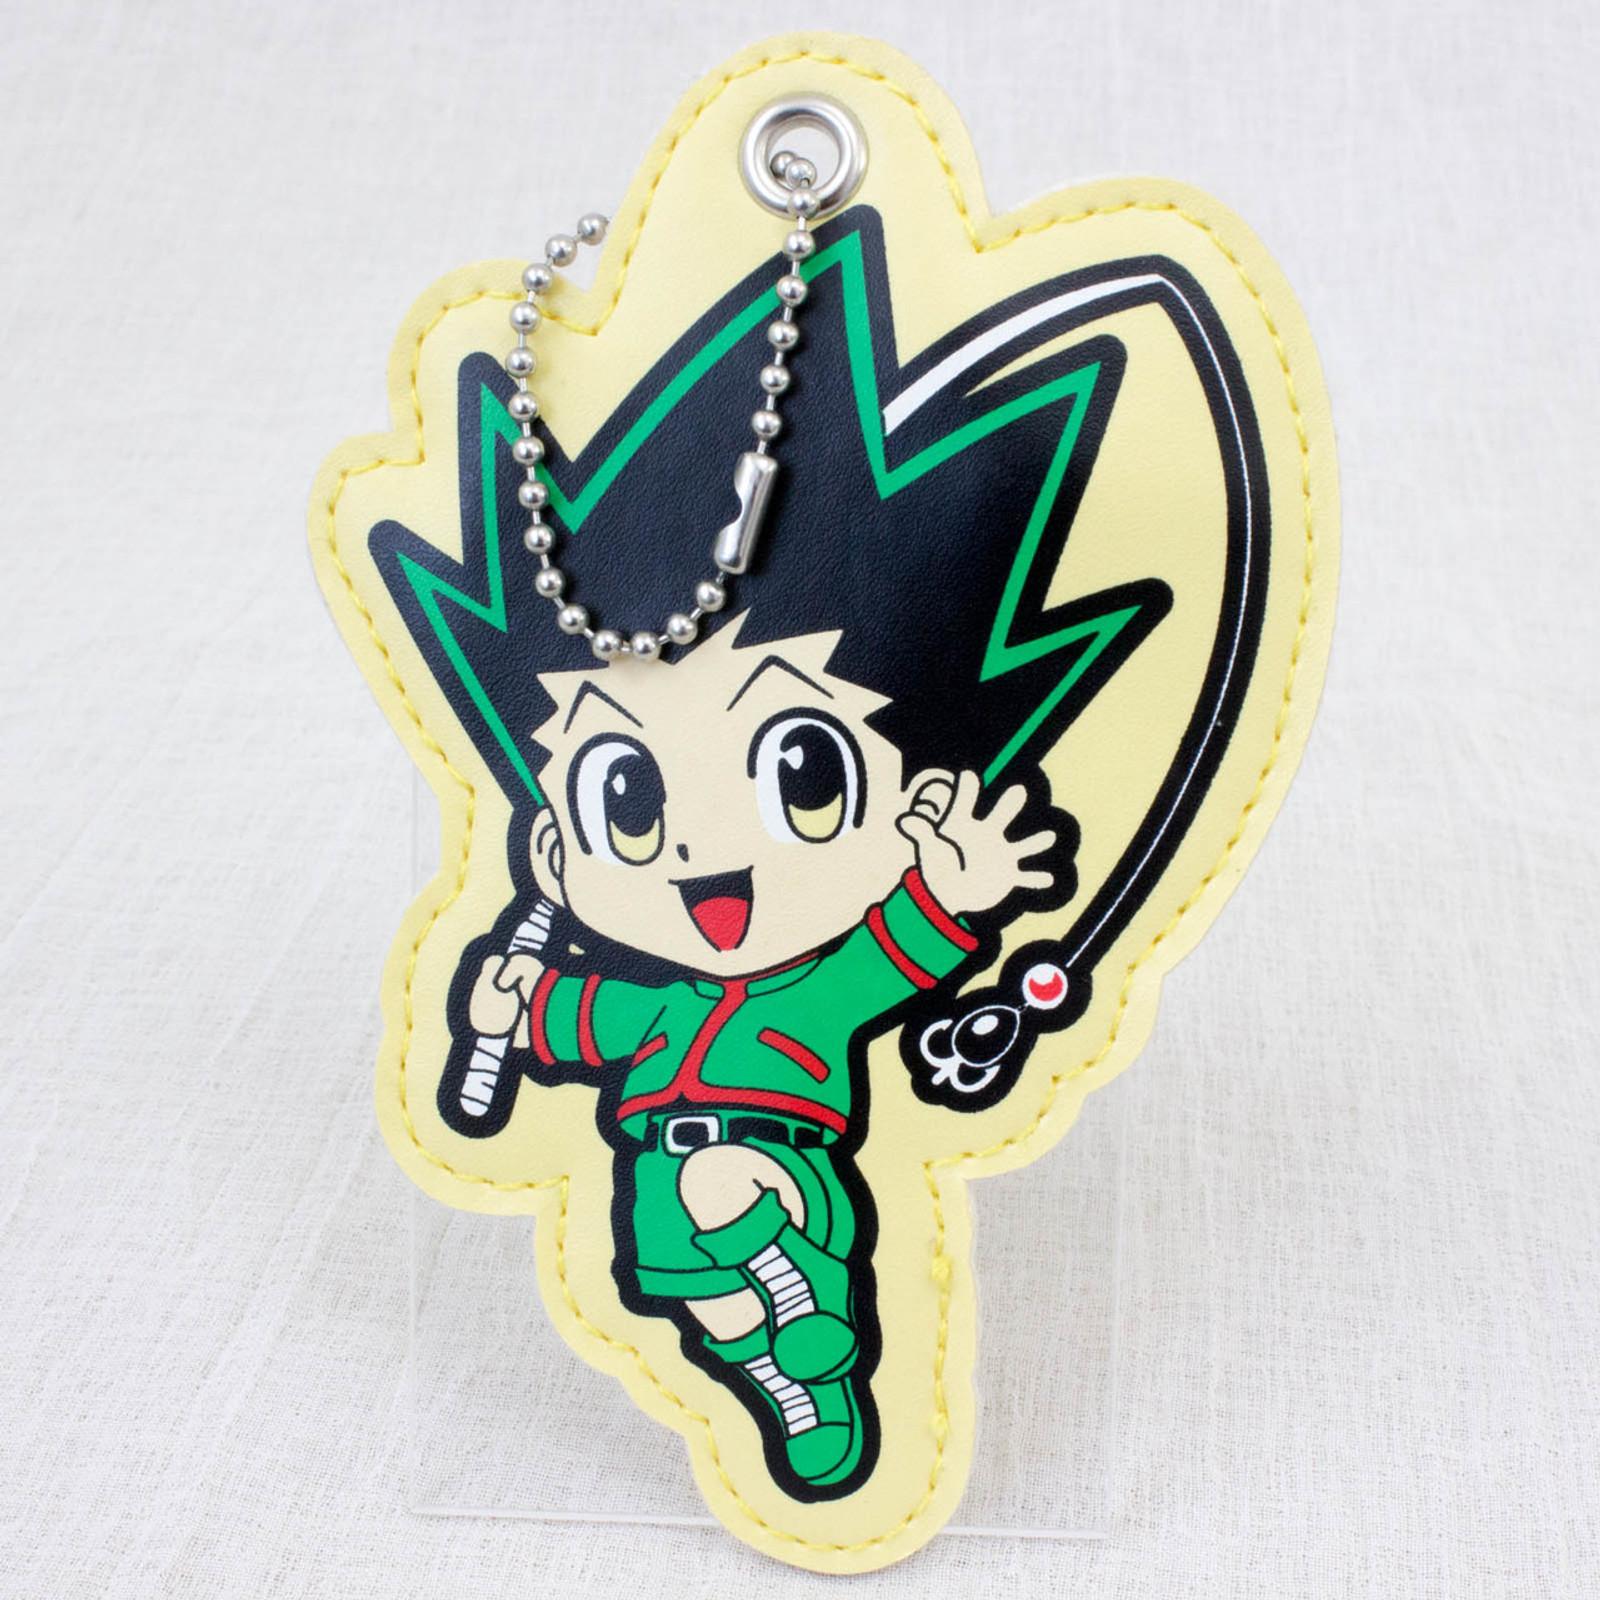 Hunter X Hunter Last Mission Movie Gon Freecss Mascot Coin Case Japan Anime Последние твиты от gungi (@gungiapp). japanimedia ex